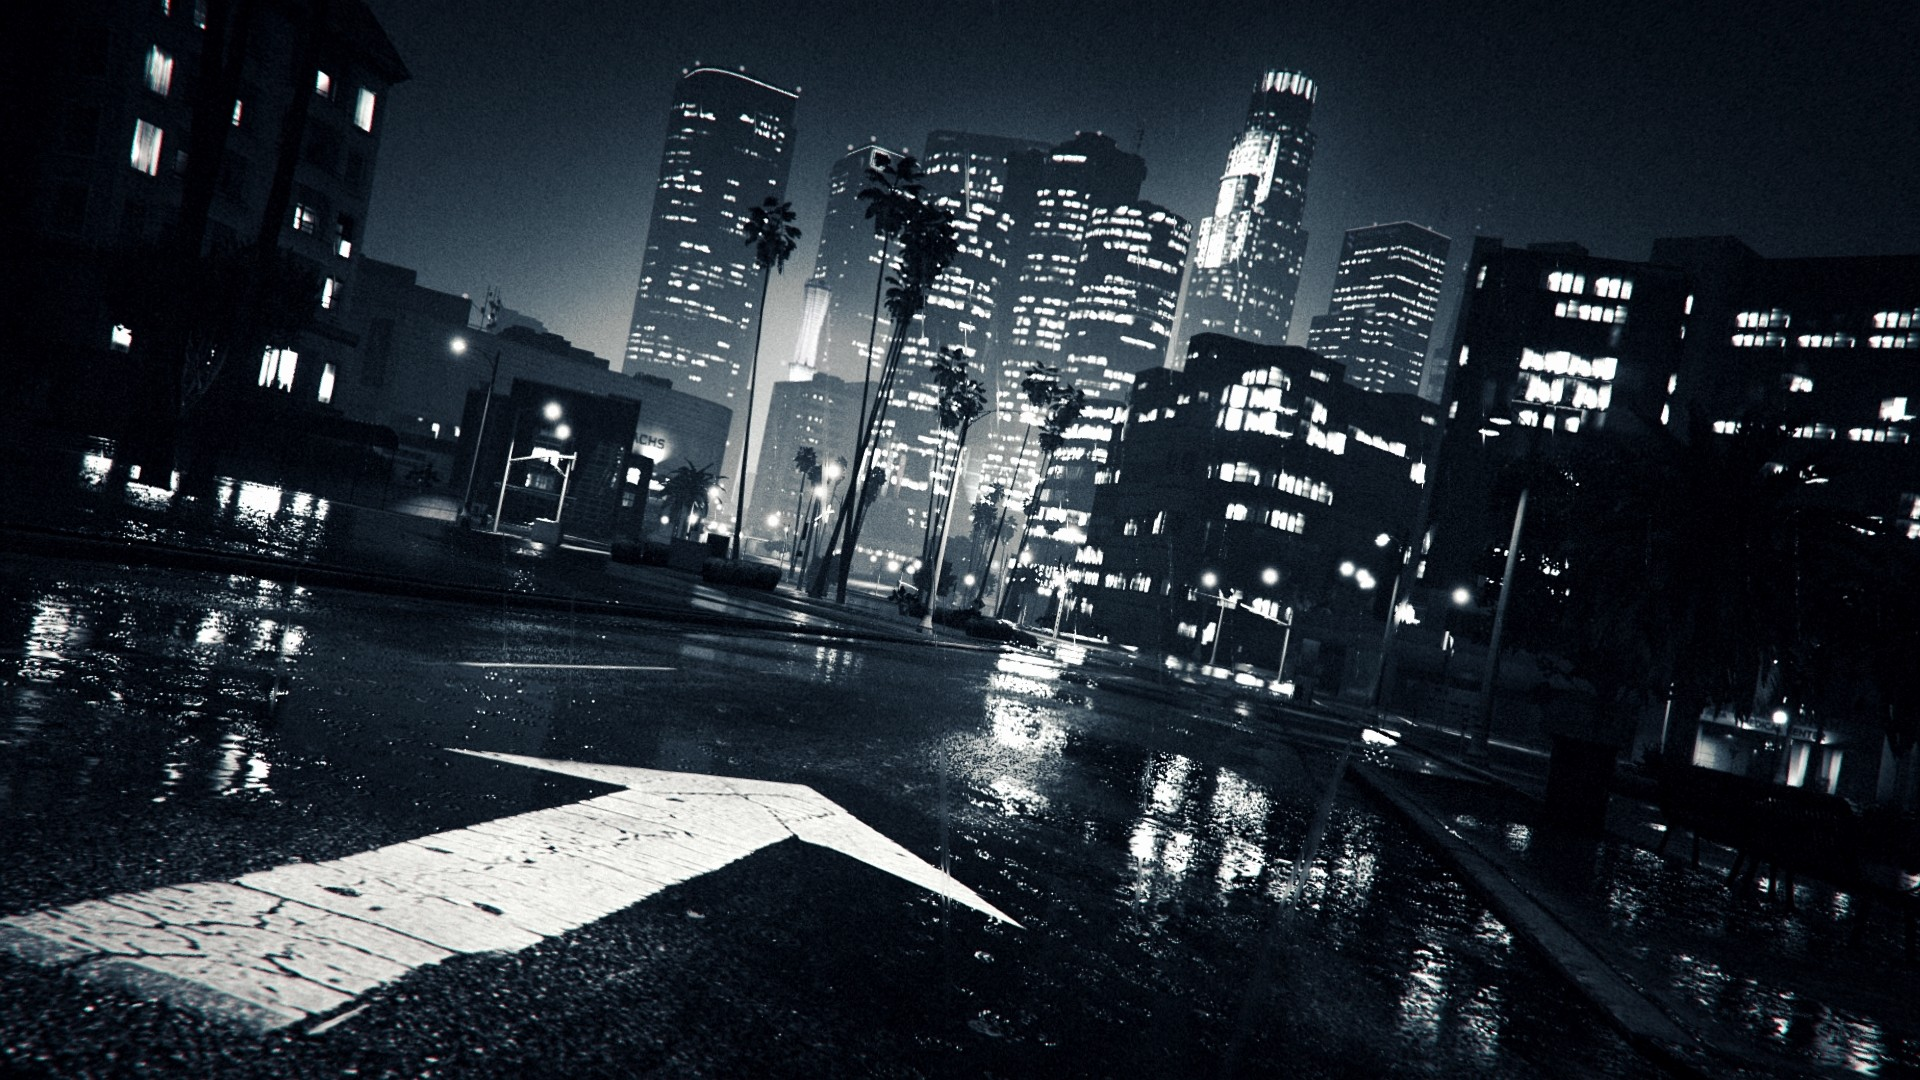 Dark City Wallpaper Free Download